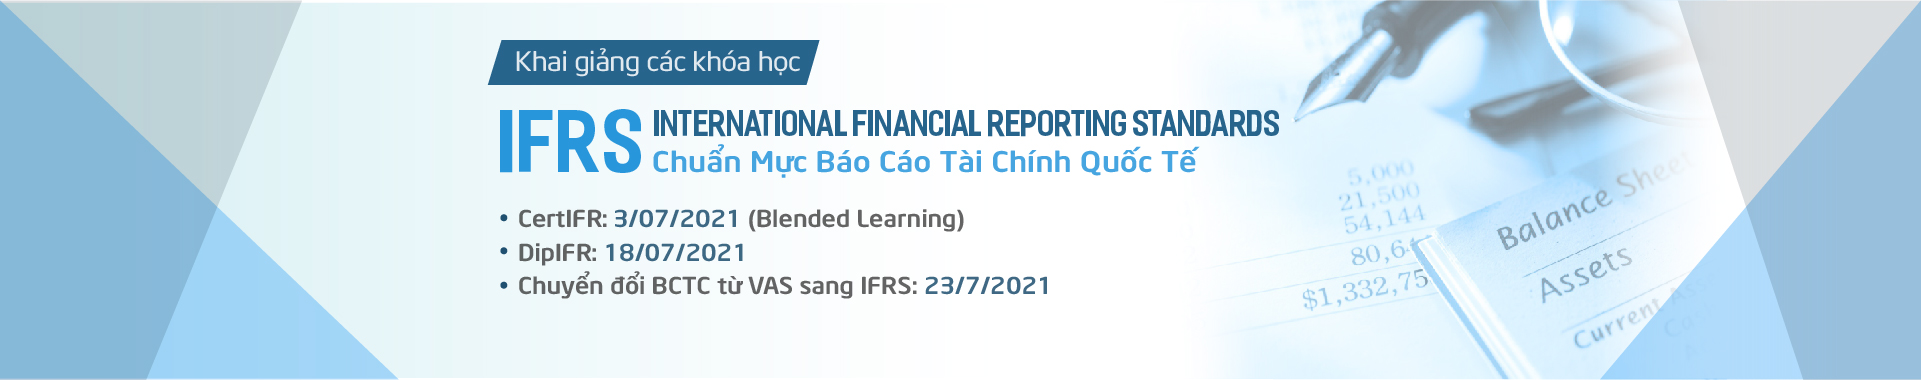 CHUAN MUC BCTC QUOC TE IFRS_Banner web